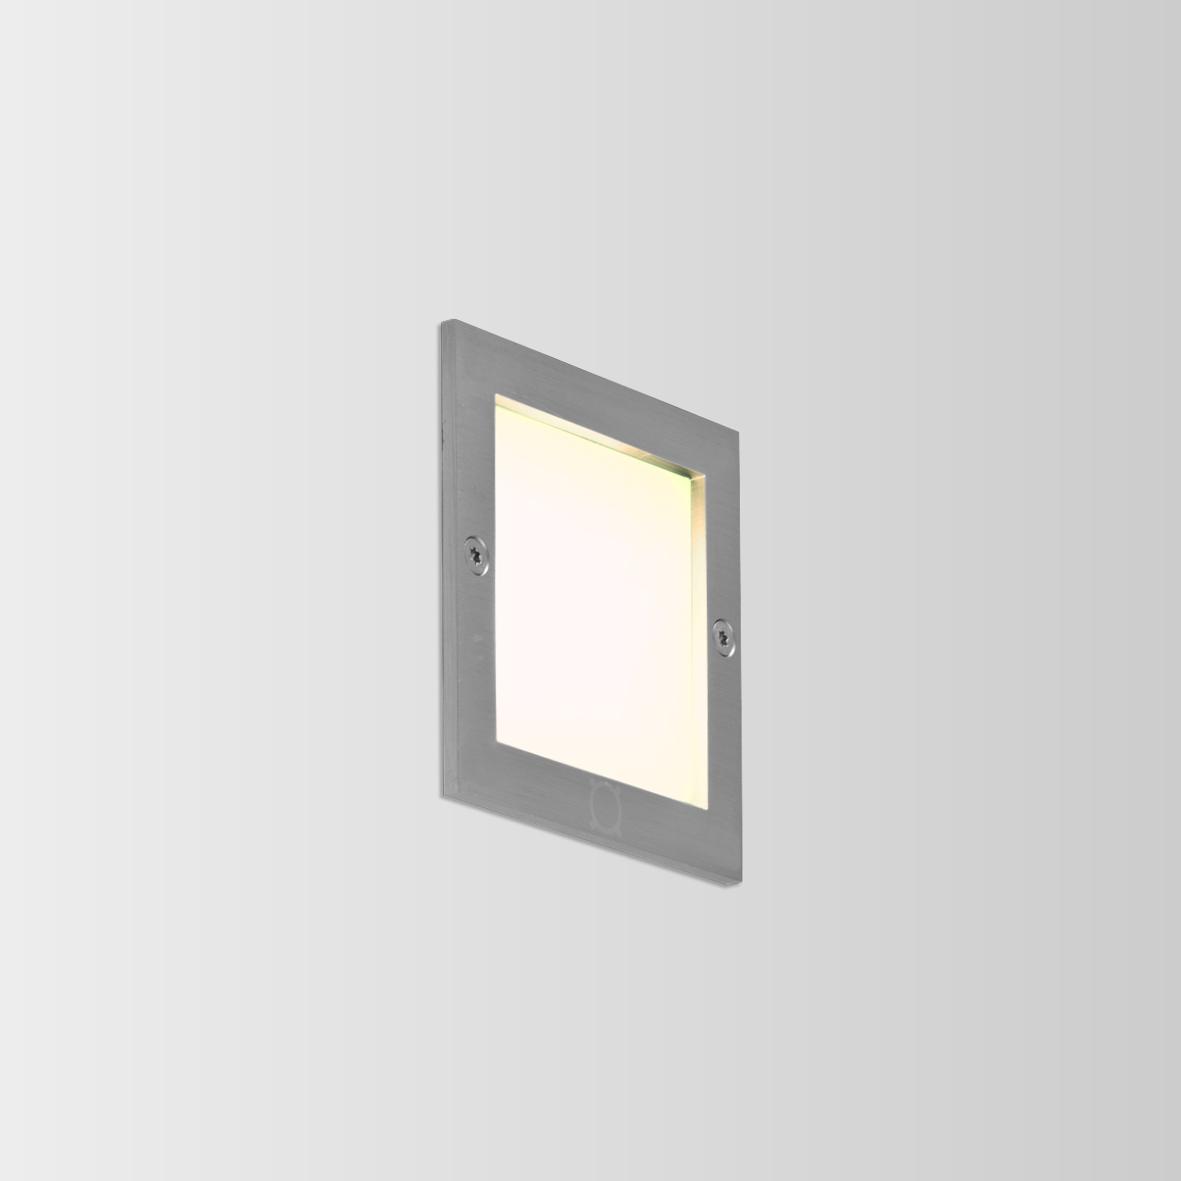 ATIM CARRÉ 2.0 LED 3000K DIM INOX 6W 80CRI 220-240VAC, välisvalgusti seina süvistatud